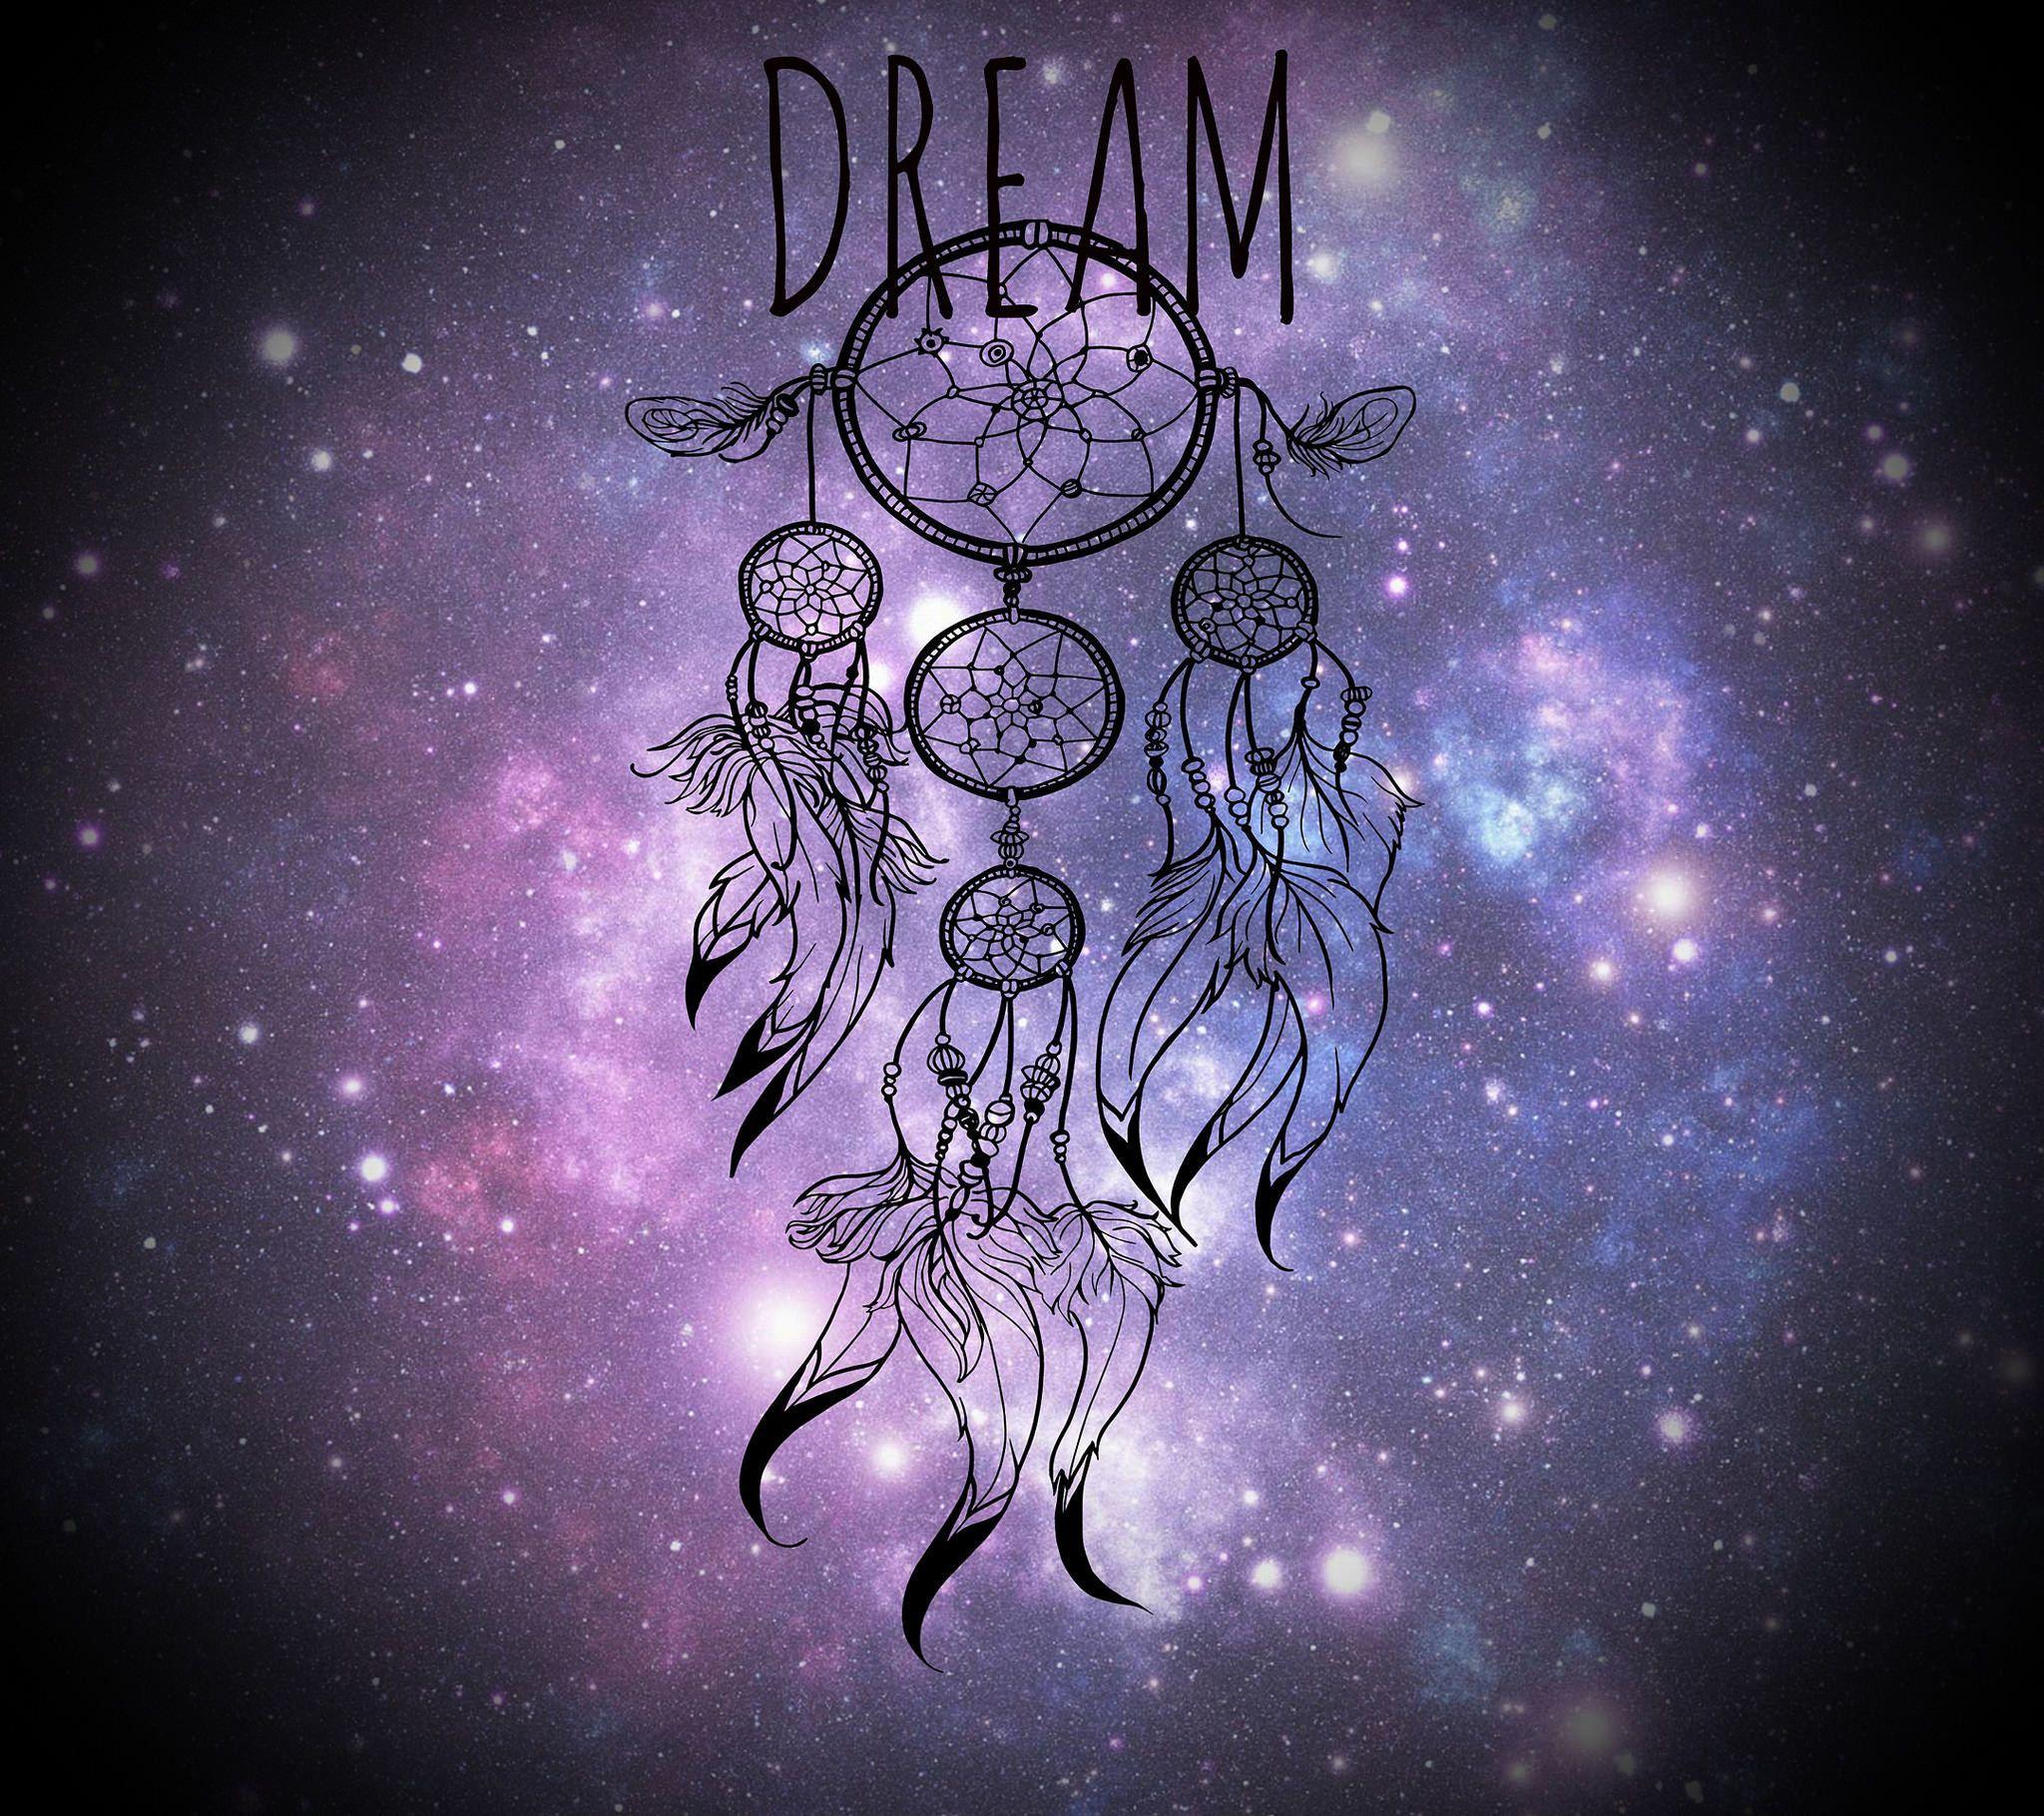 Dream Catcher Wallpapers Top Free Dream Catcher Backgrounds